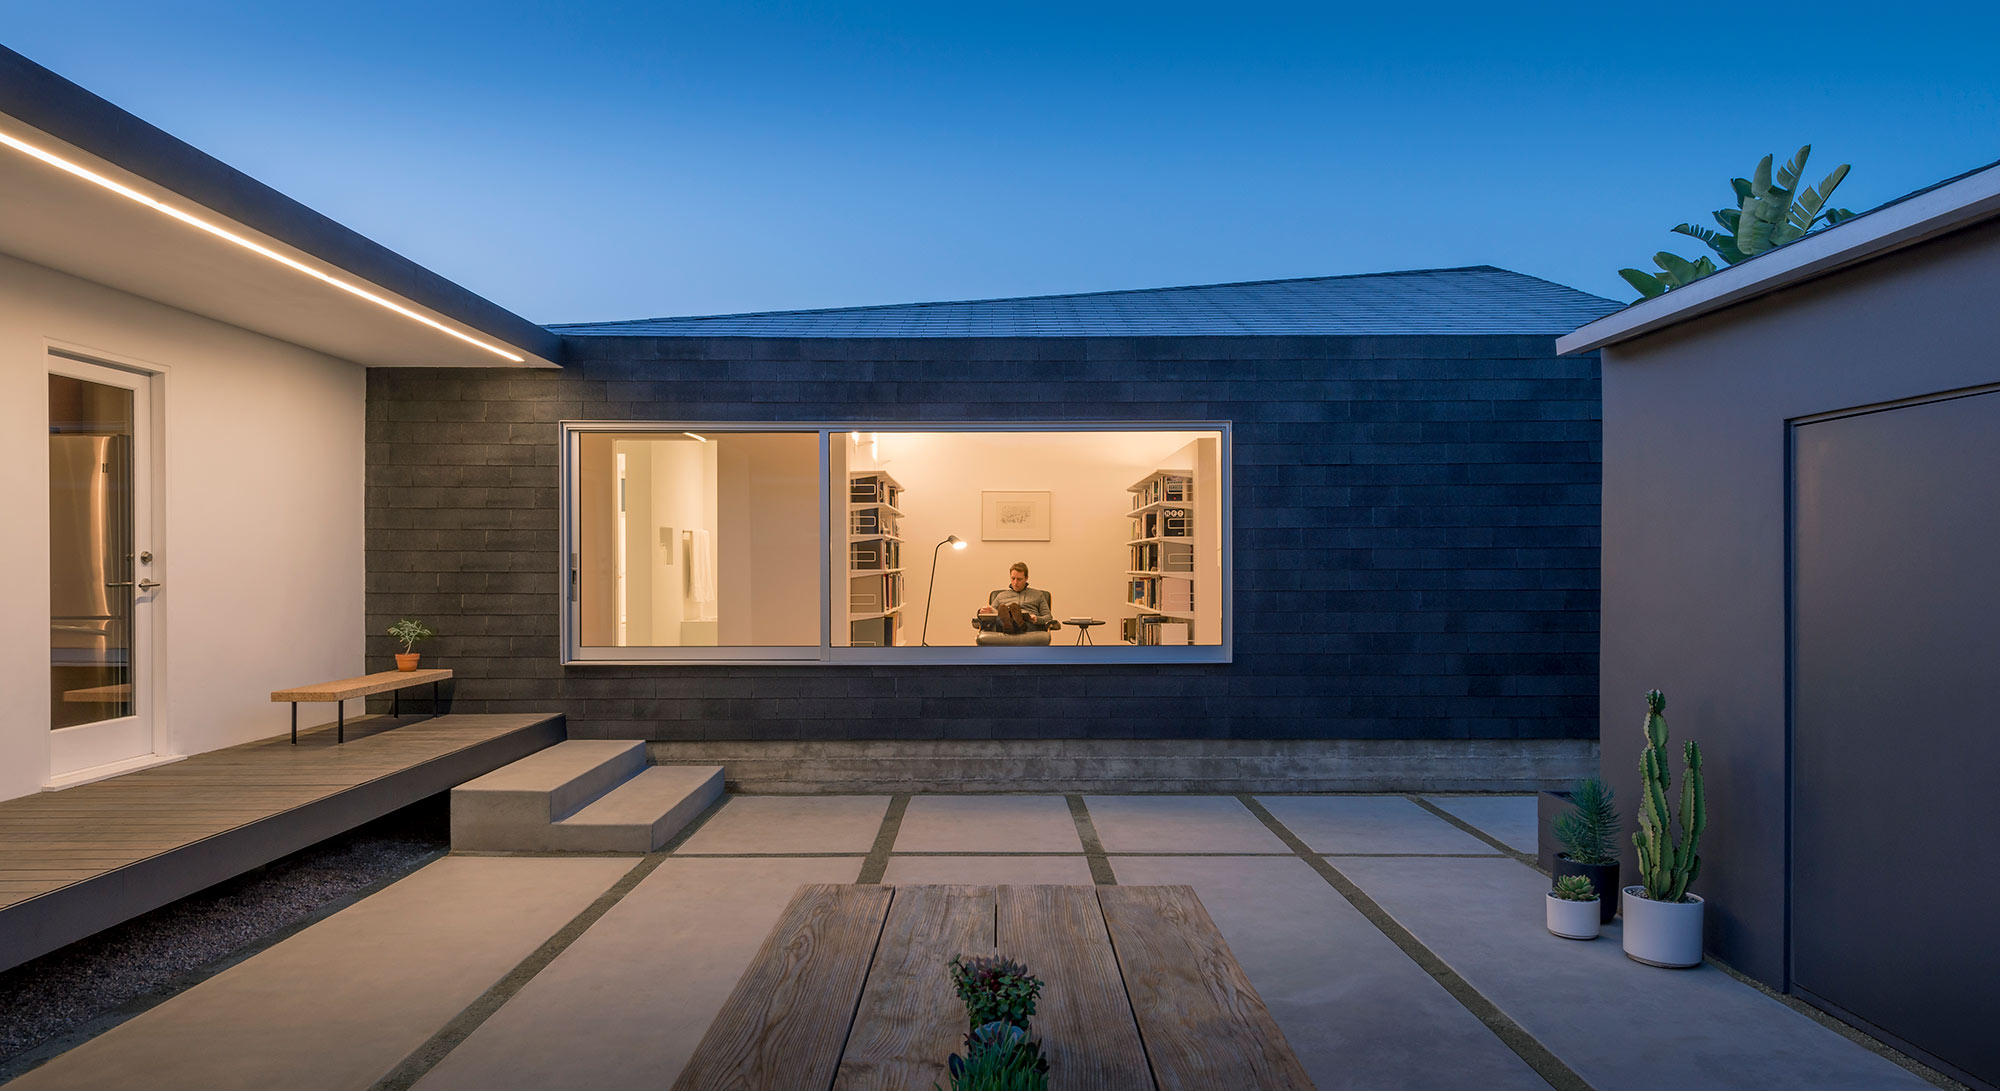 Modern Architecture Los Angeles edward ogosta architecture: los angeles architects